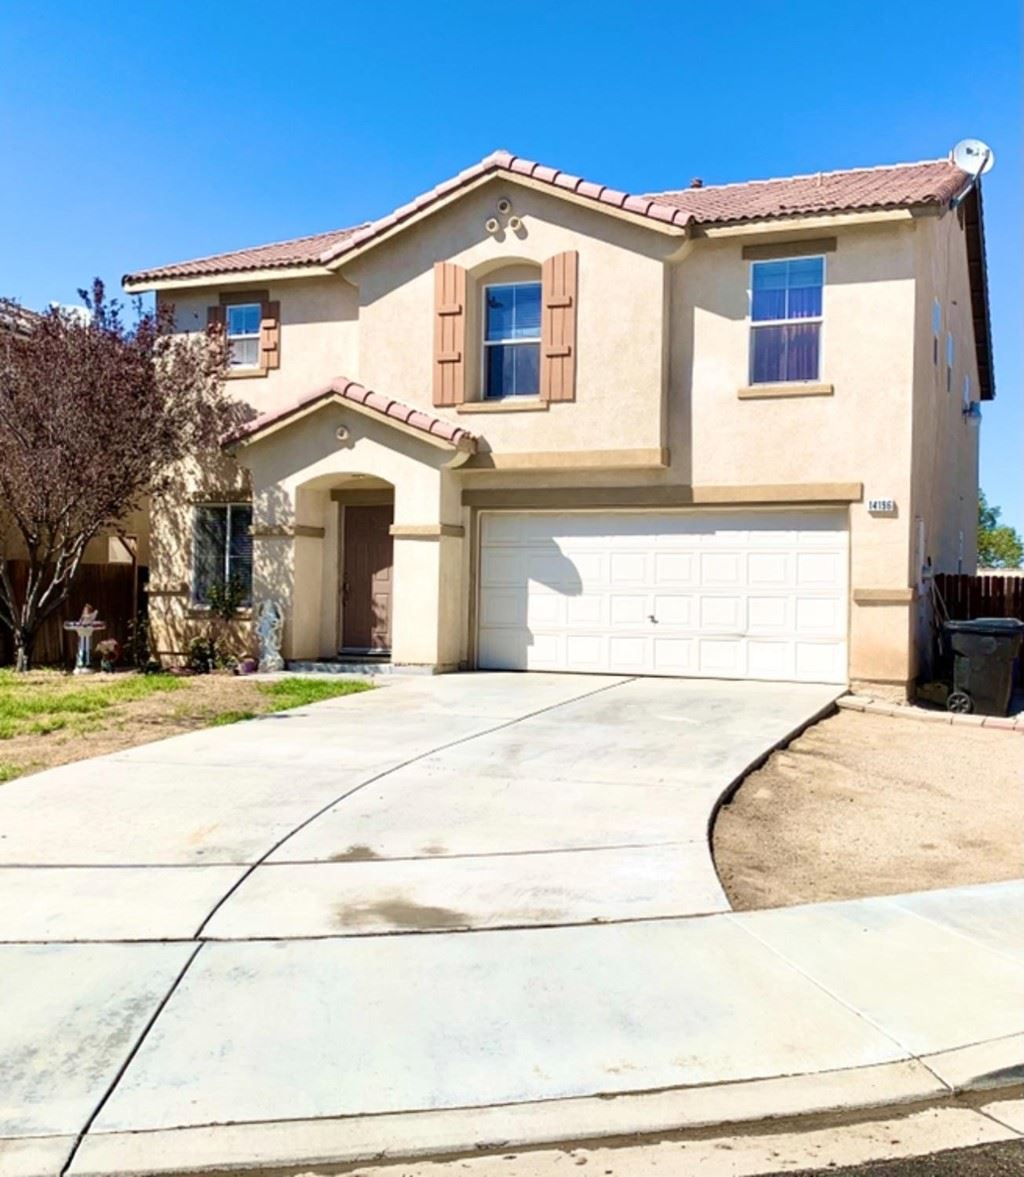 14196 Paddock Road, Victorville, CA 92394 - MLS#: 540197